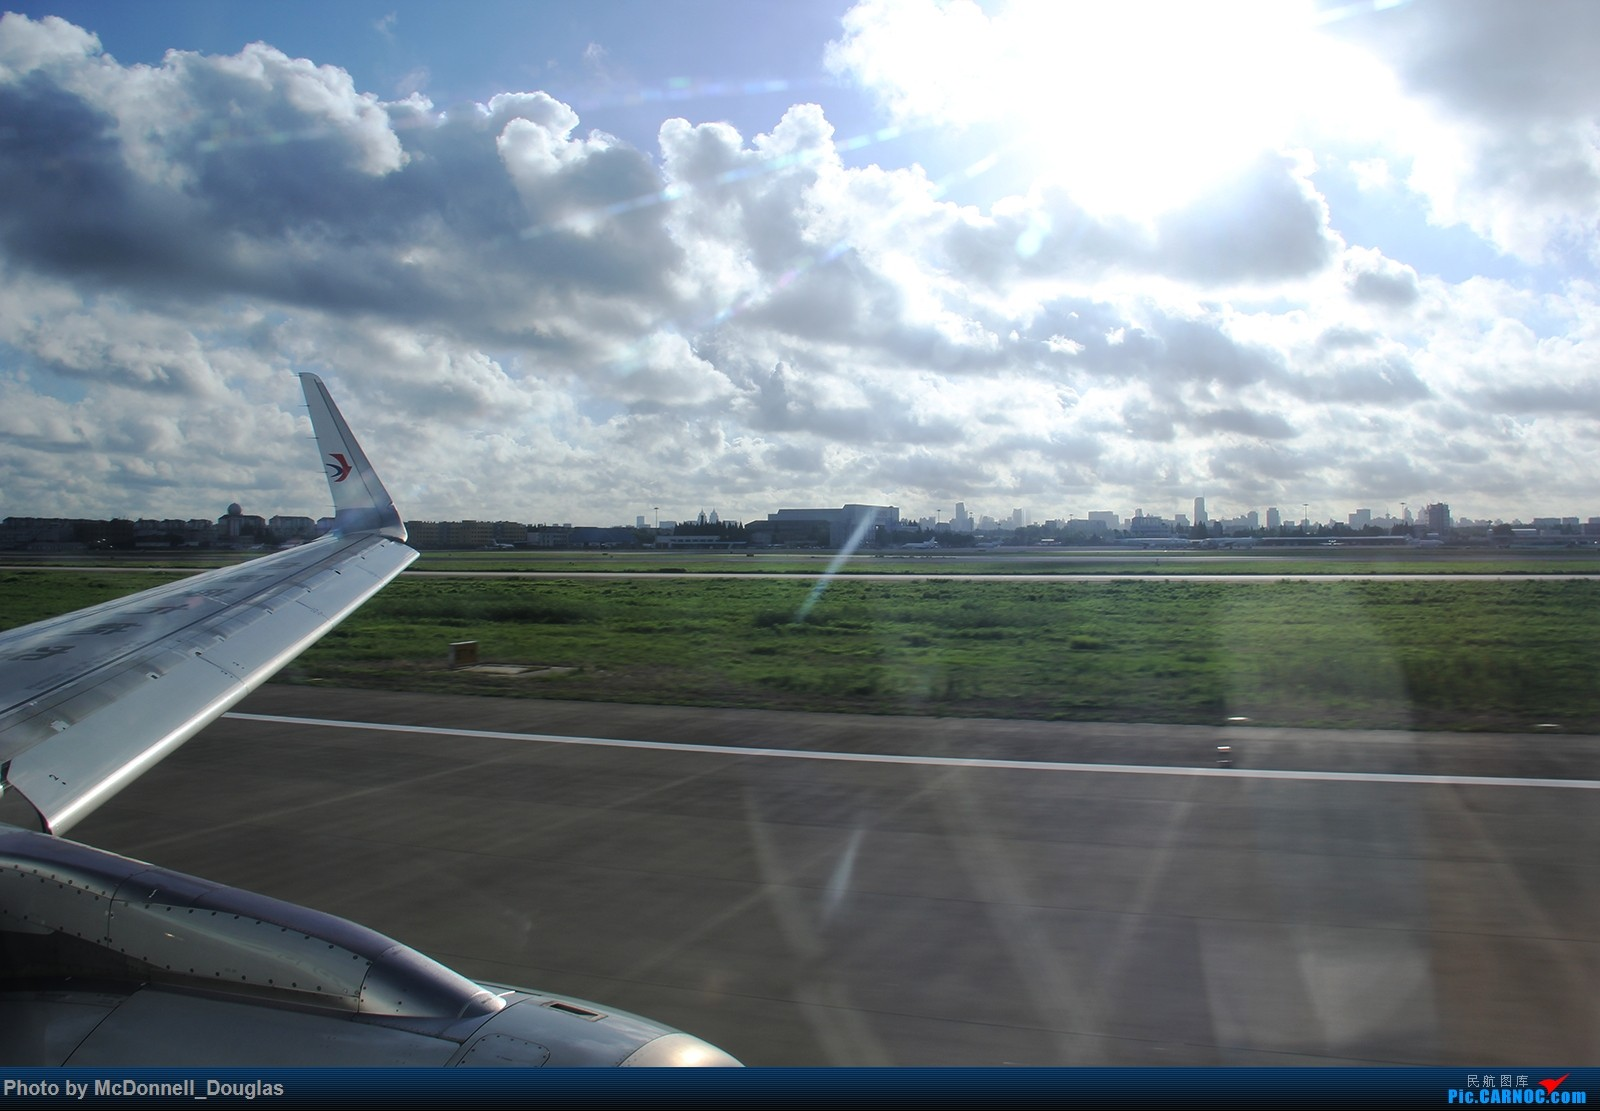 Re:[原创]【上海飞友会】【zc带你走天下(2)】再访祖辈年轻时工作的土地,父母年少时生活戈壁,跨越大半个中国去看新疆,回程小游蓉城(上) AIRBUS A320-232 B-8237 中国上海虹桥国际机场